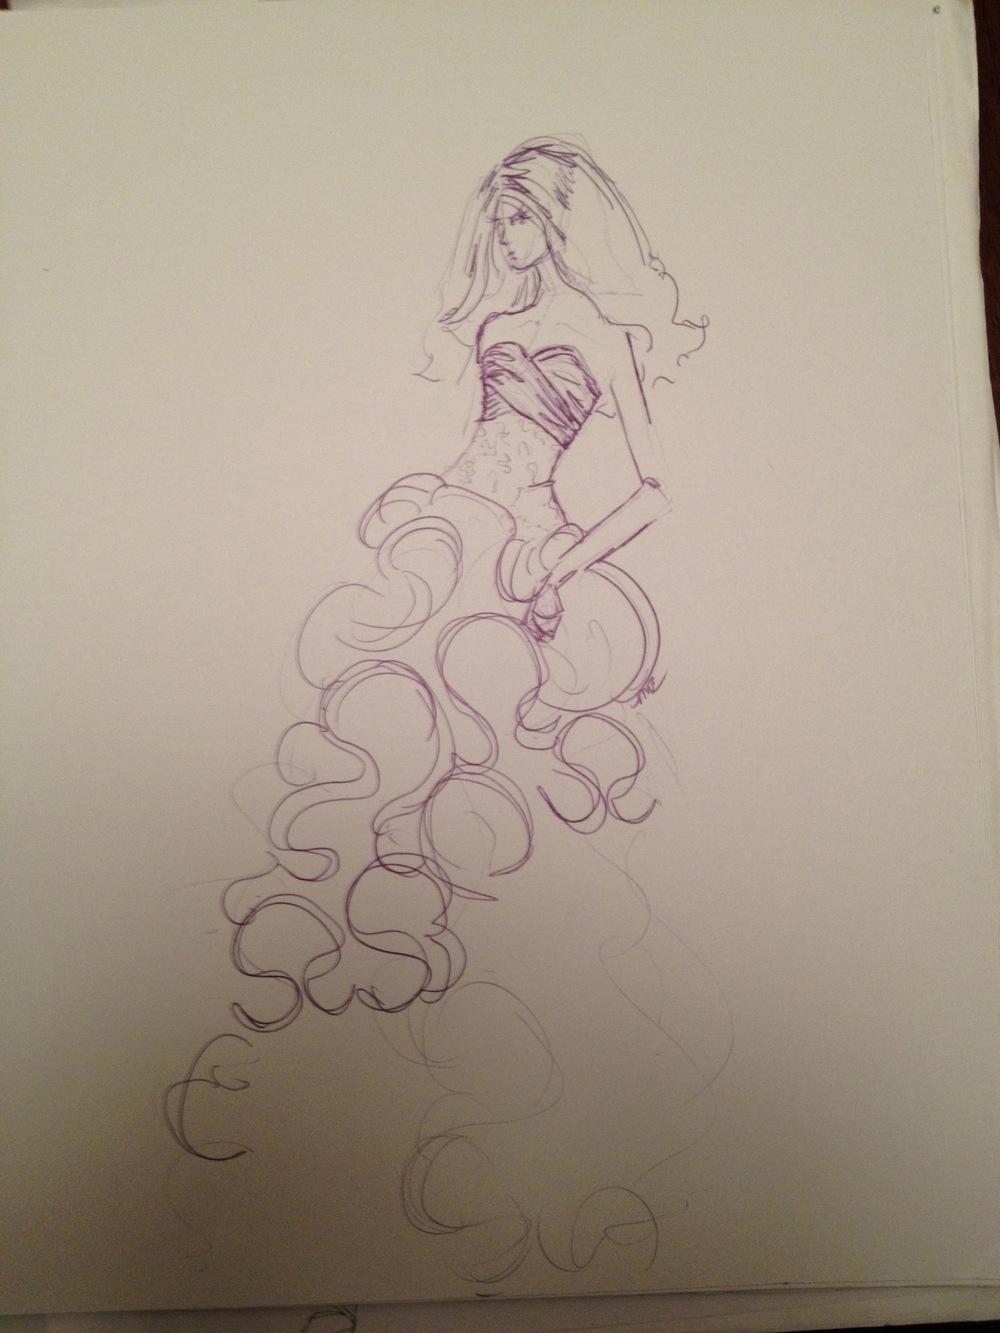 Sketch of the final design.